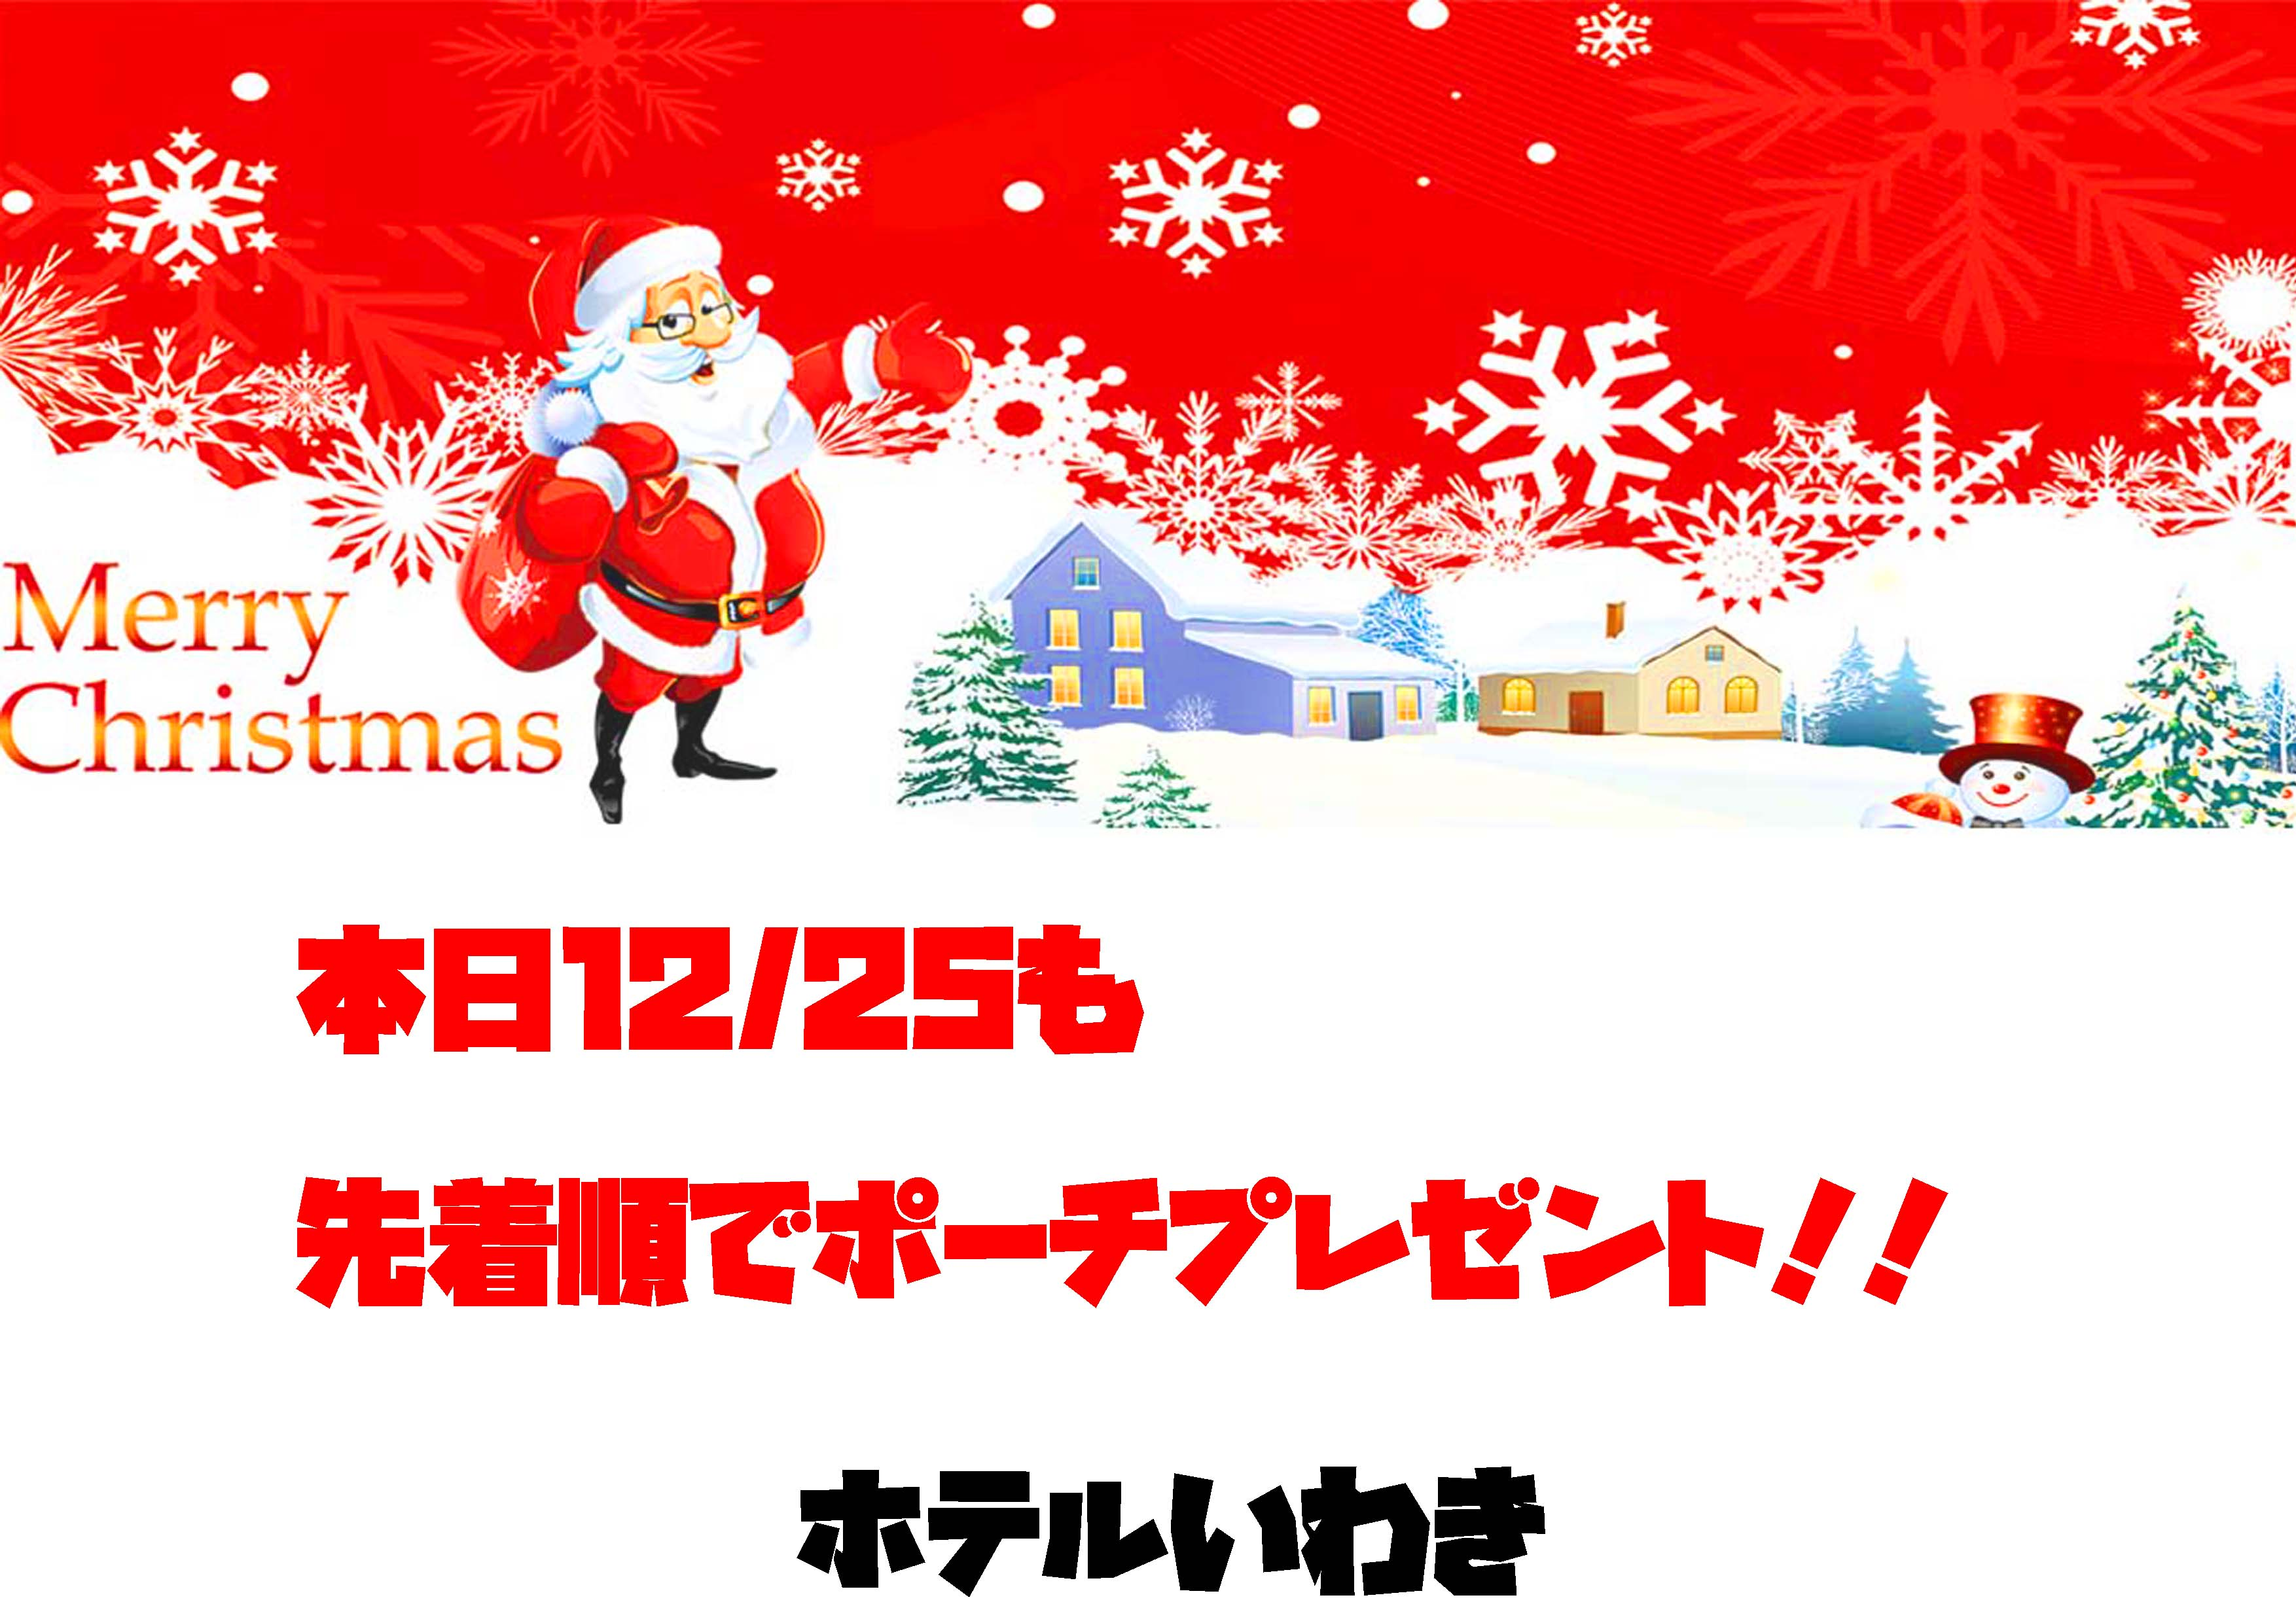 ♪Merry Christmas♪